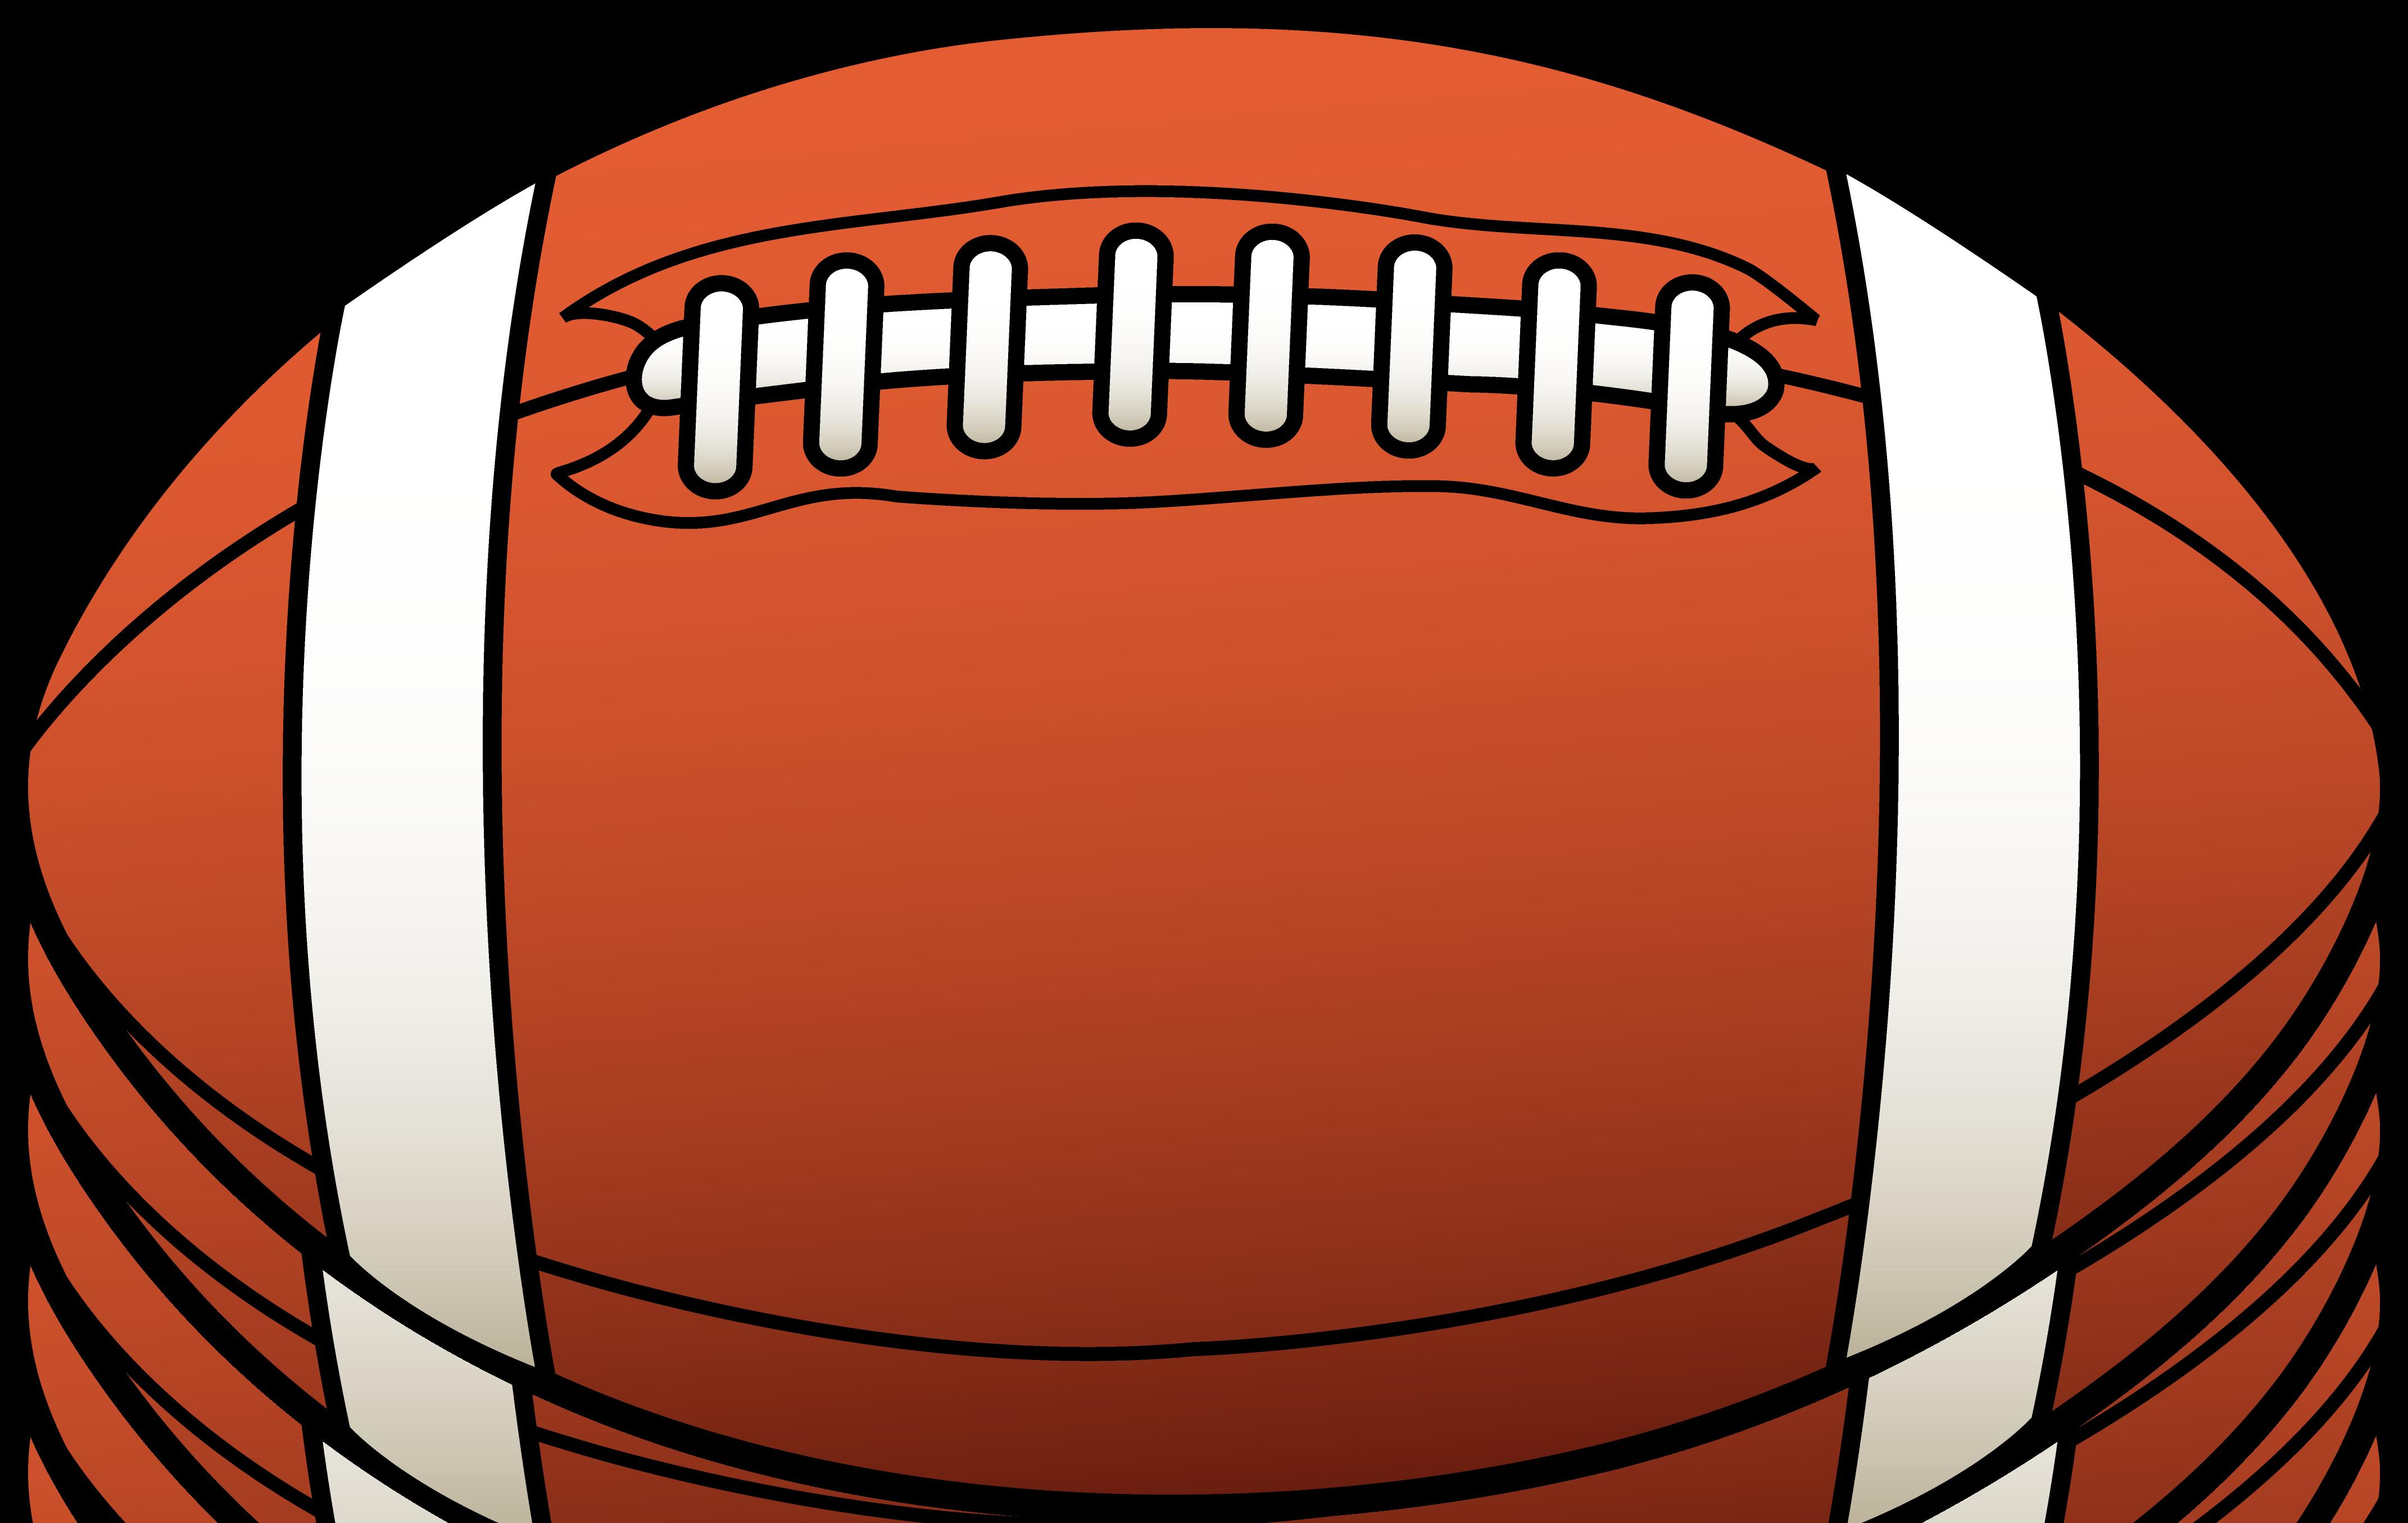 Free Footbal Clipart